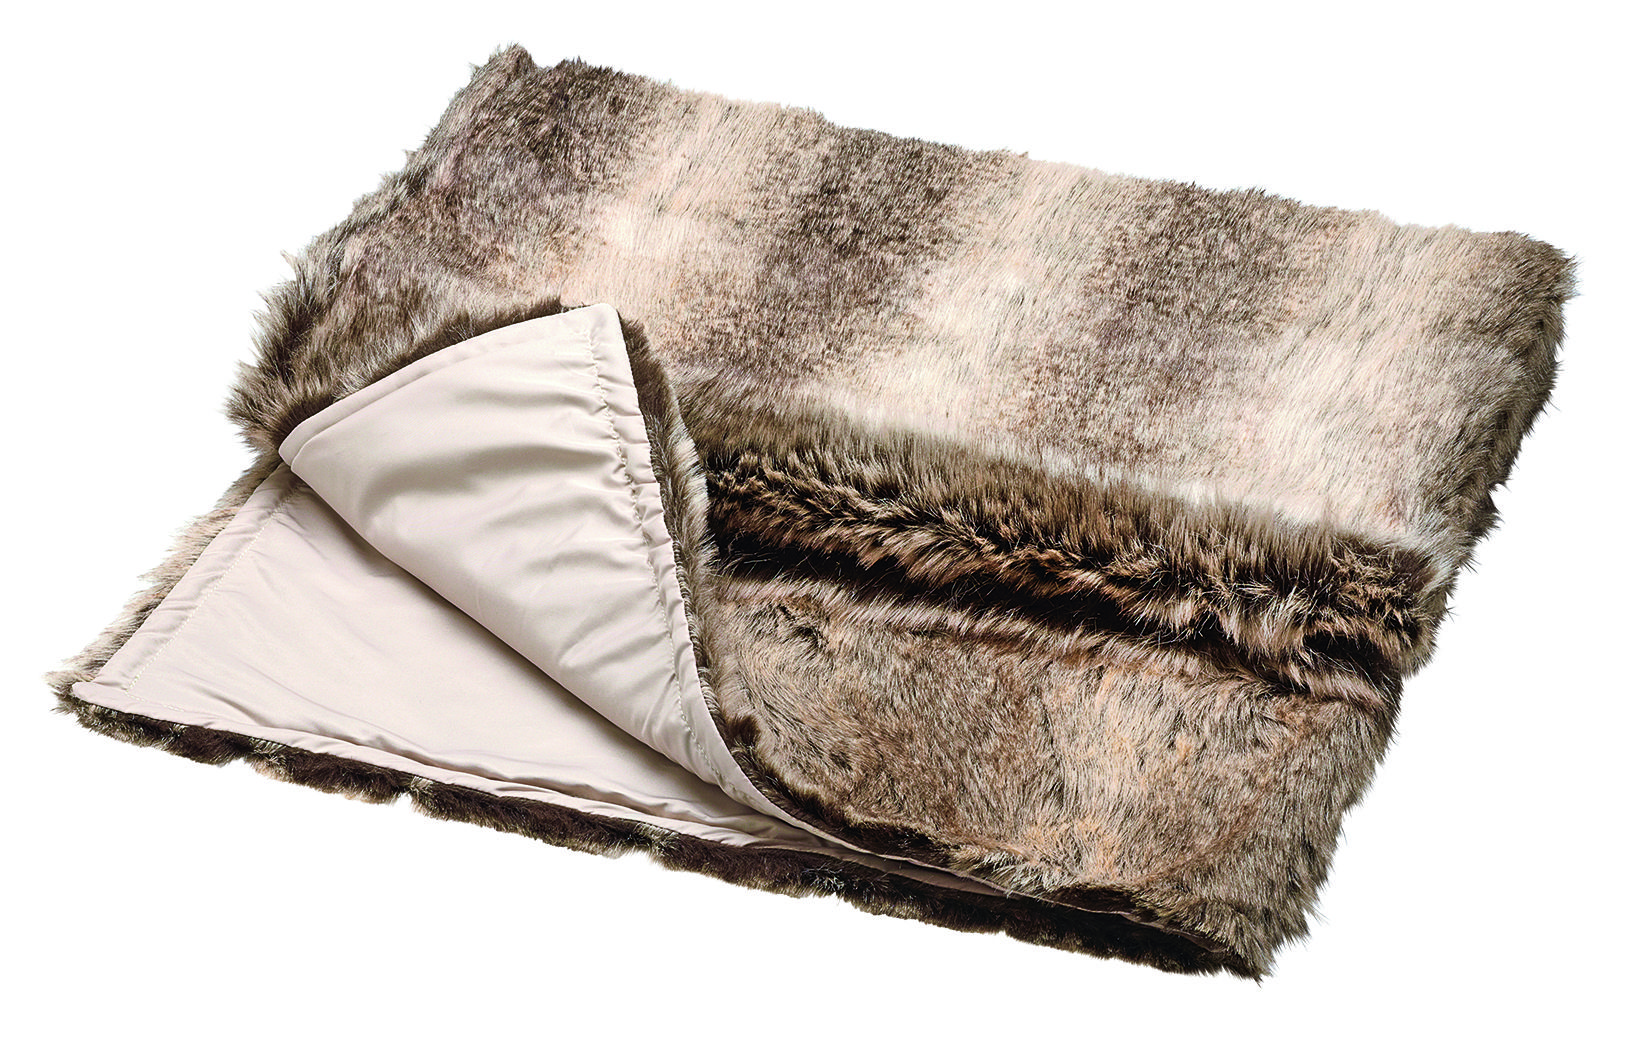 ikea sterreich chalet korallrot kissen fanby schaffell vildtulpan kissen inspiration. Black Bedroom Furniture Sets. Home Design Ideas